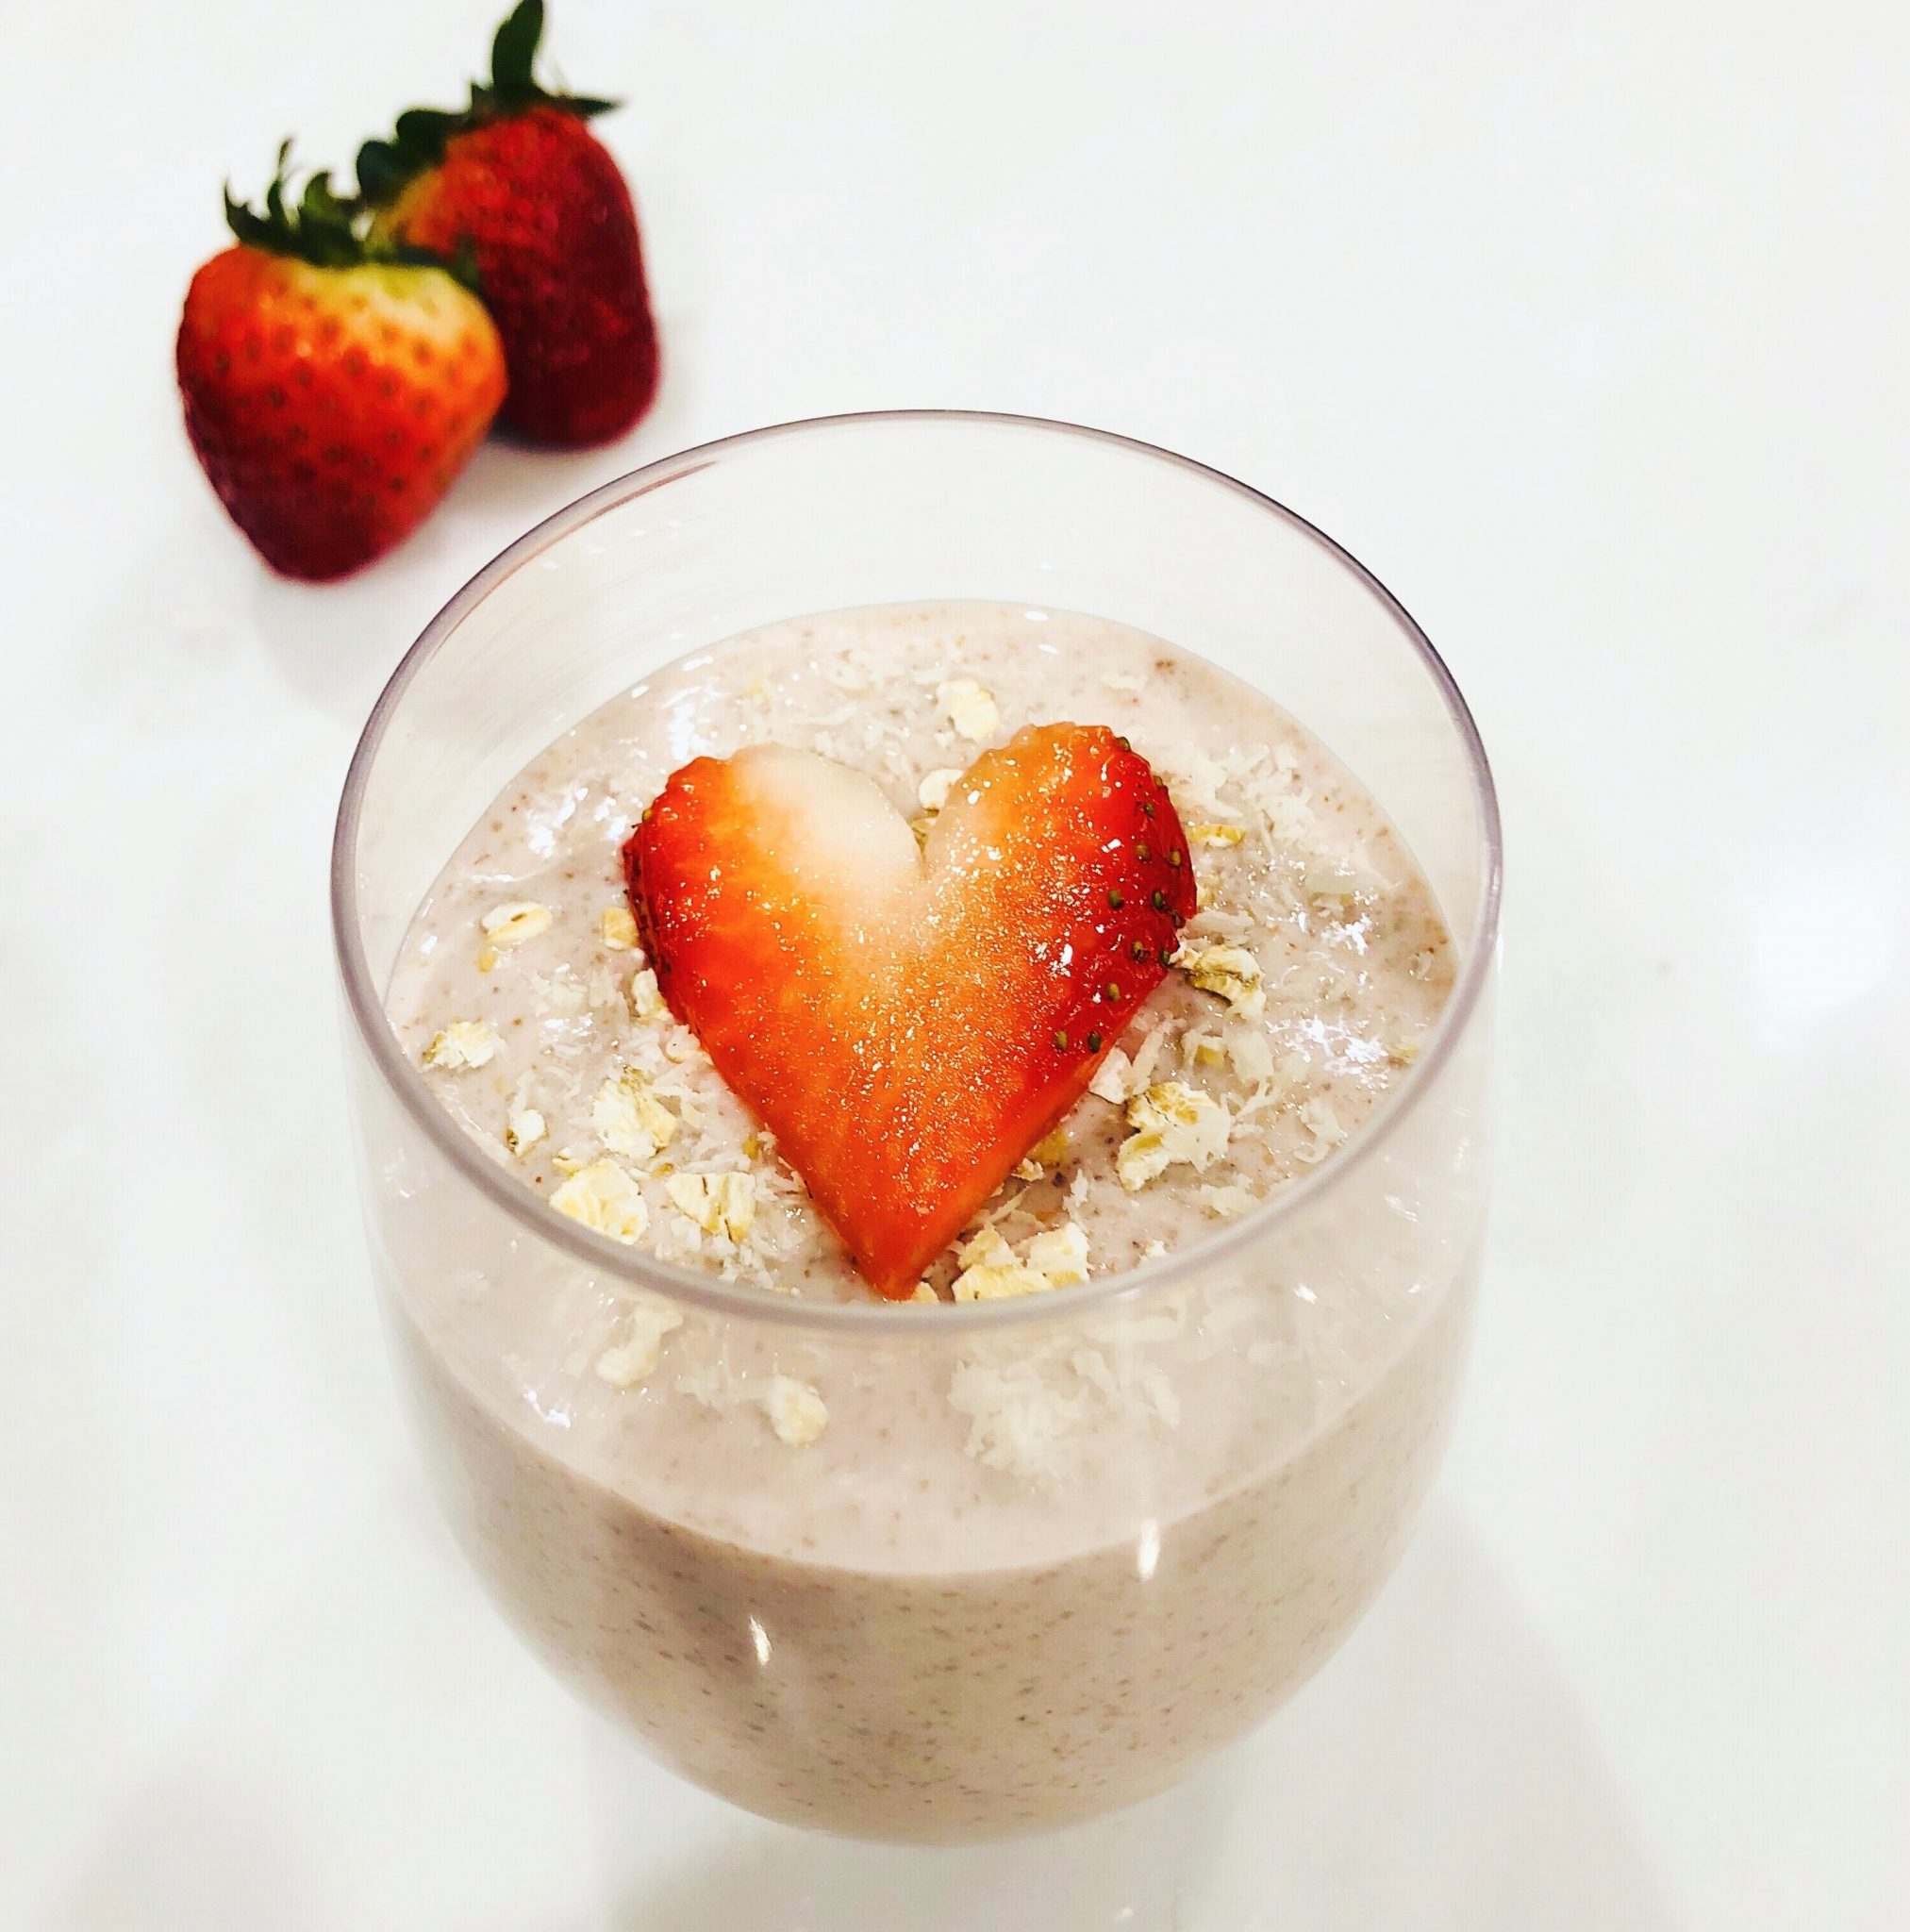 Strawberry Chia Oatmeal Pudding